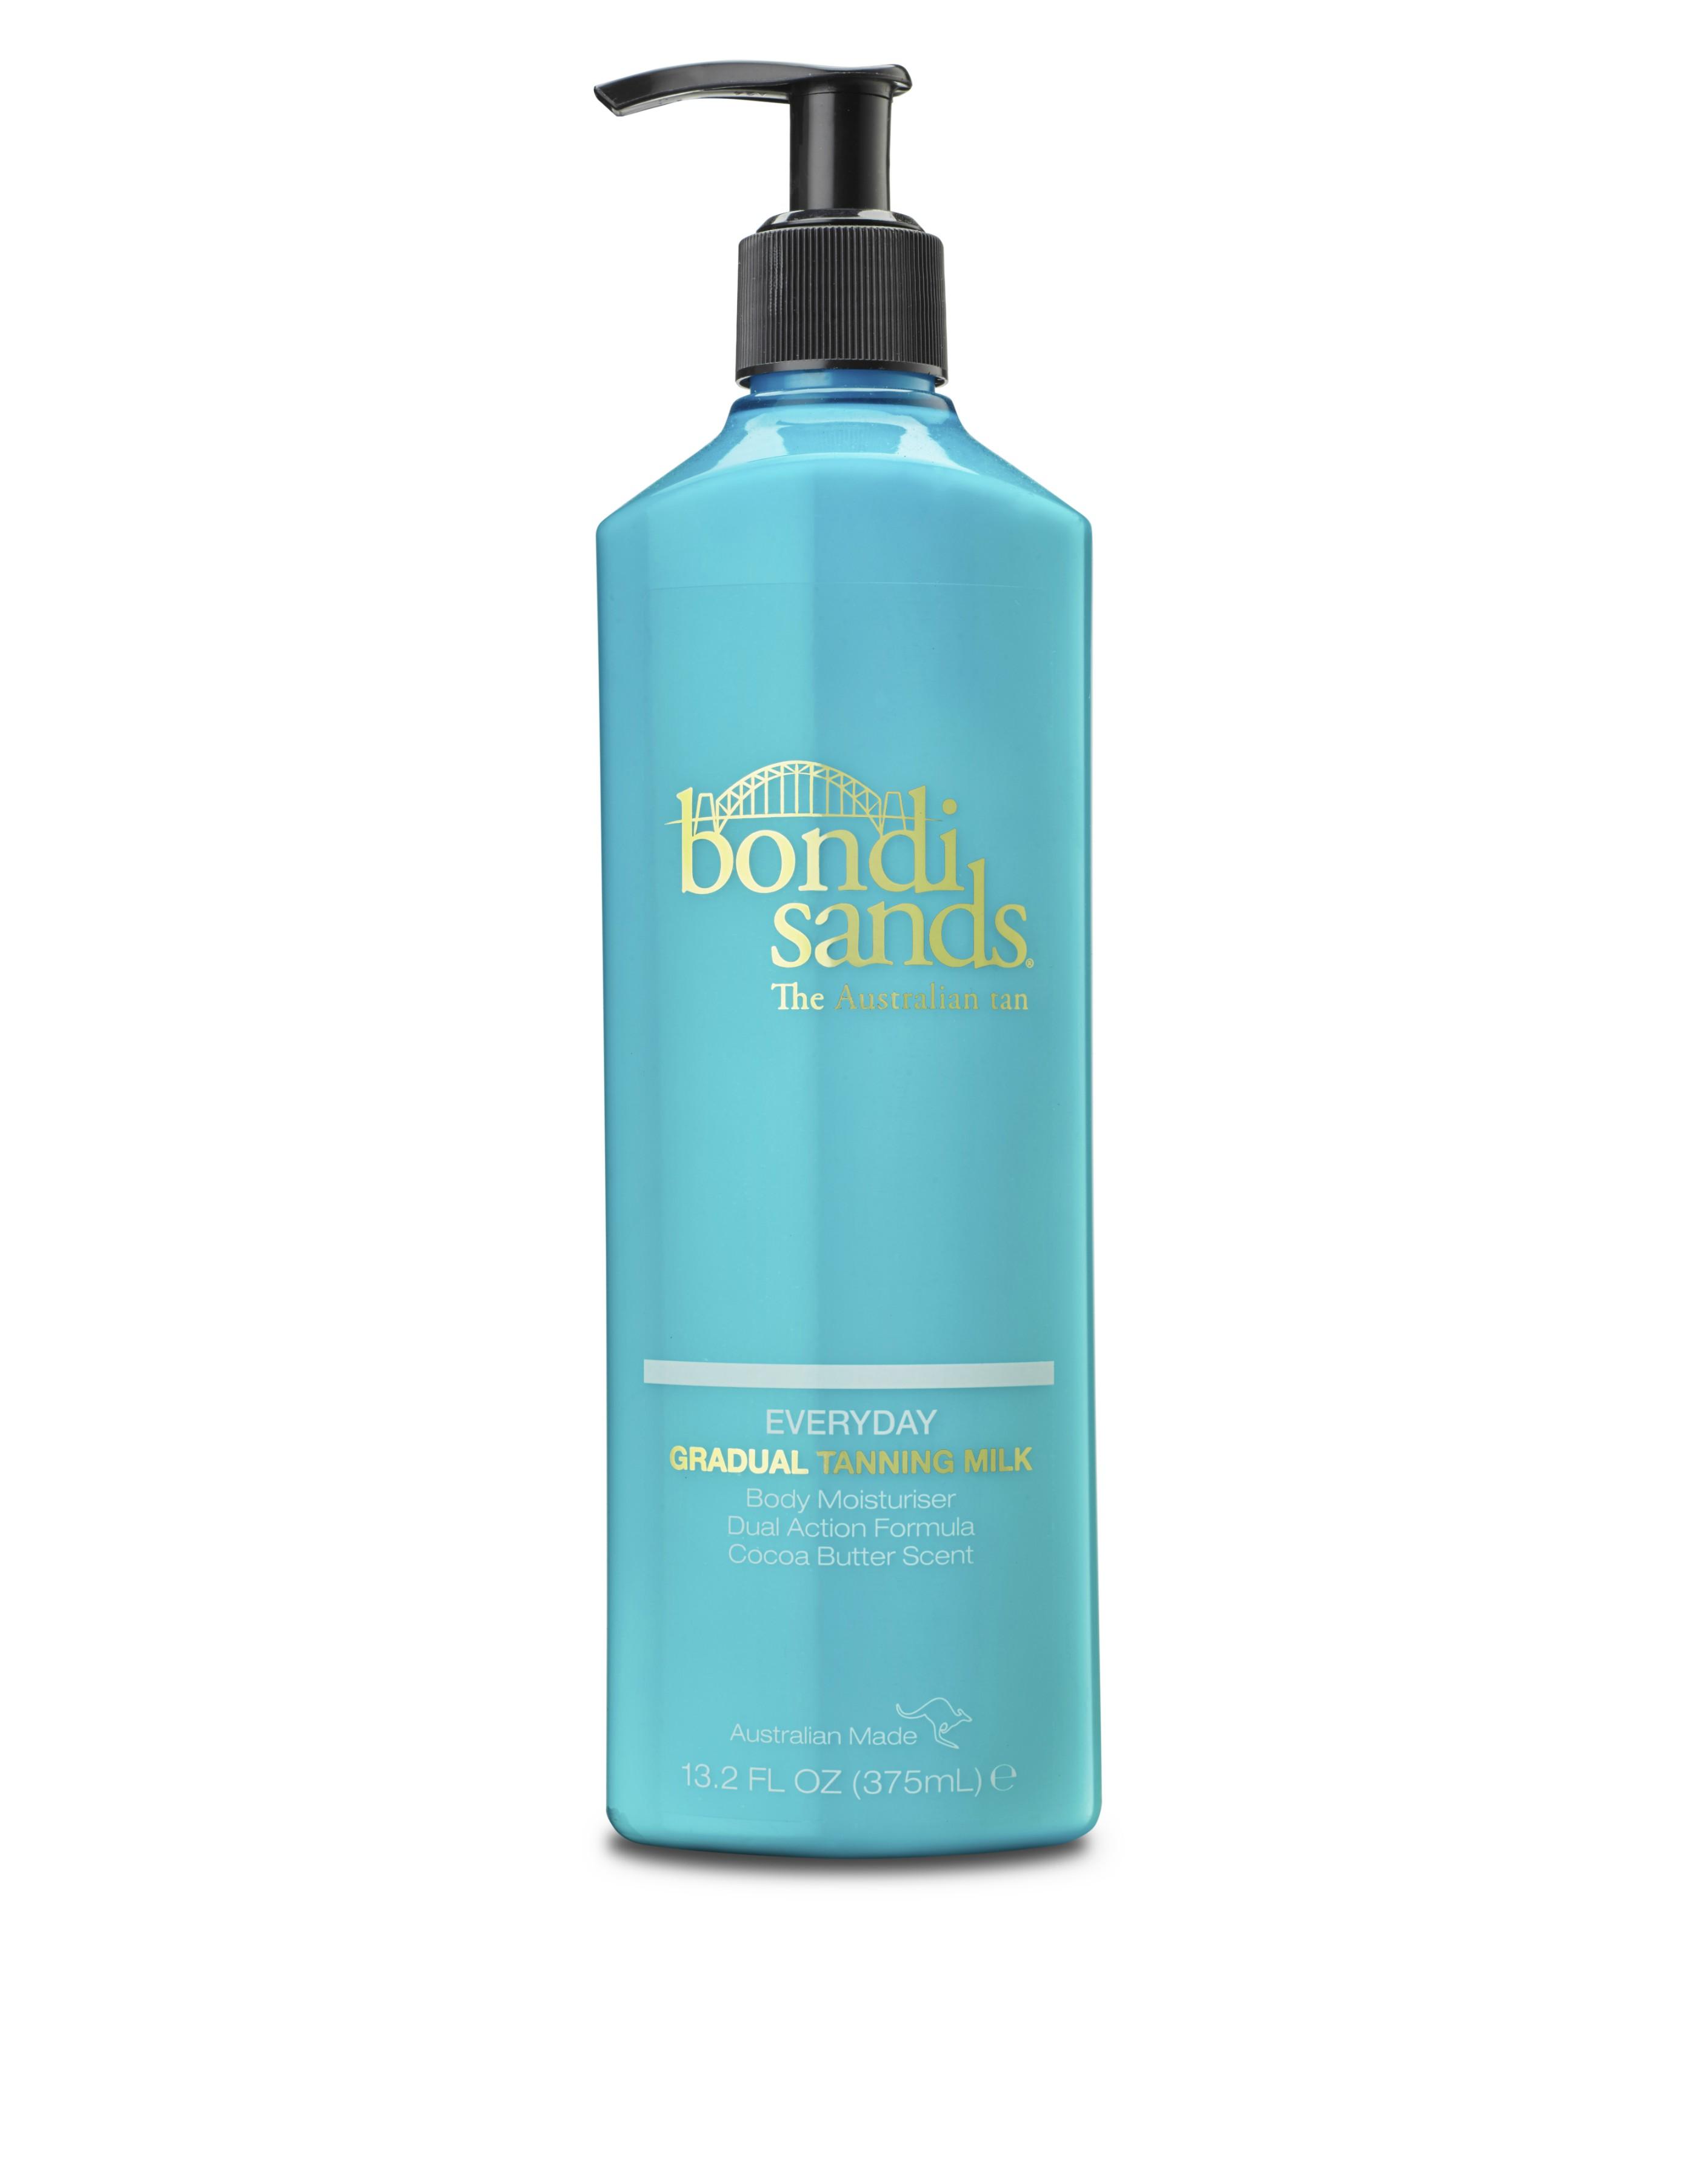 Bondi Sands Gradual Tanning Milk (375ml), RRP$22.99